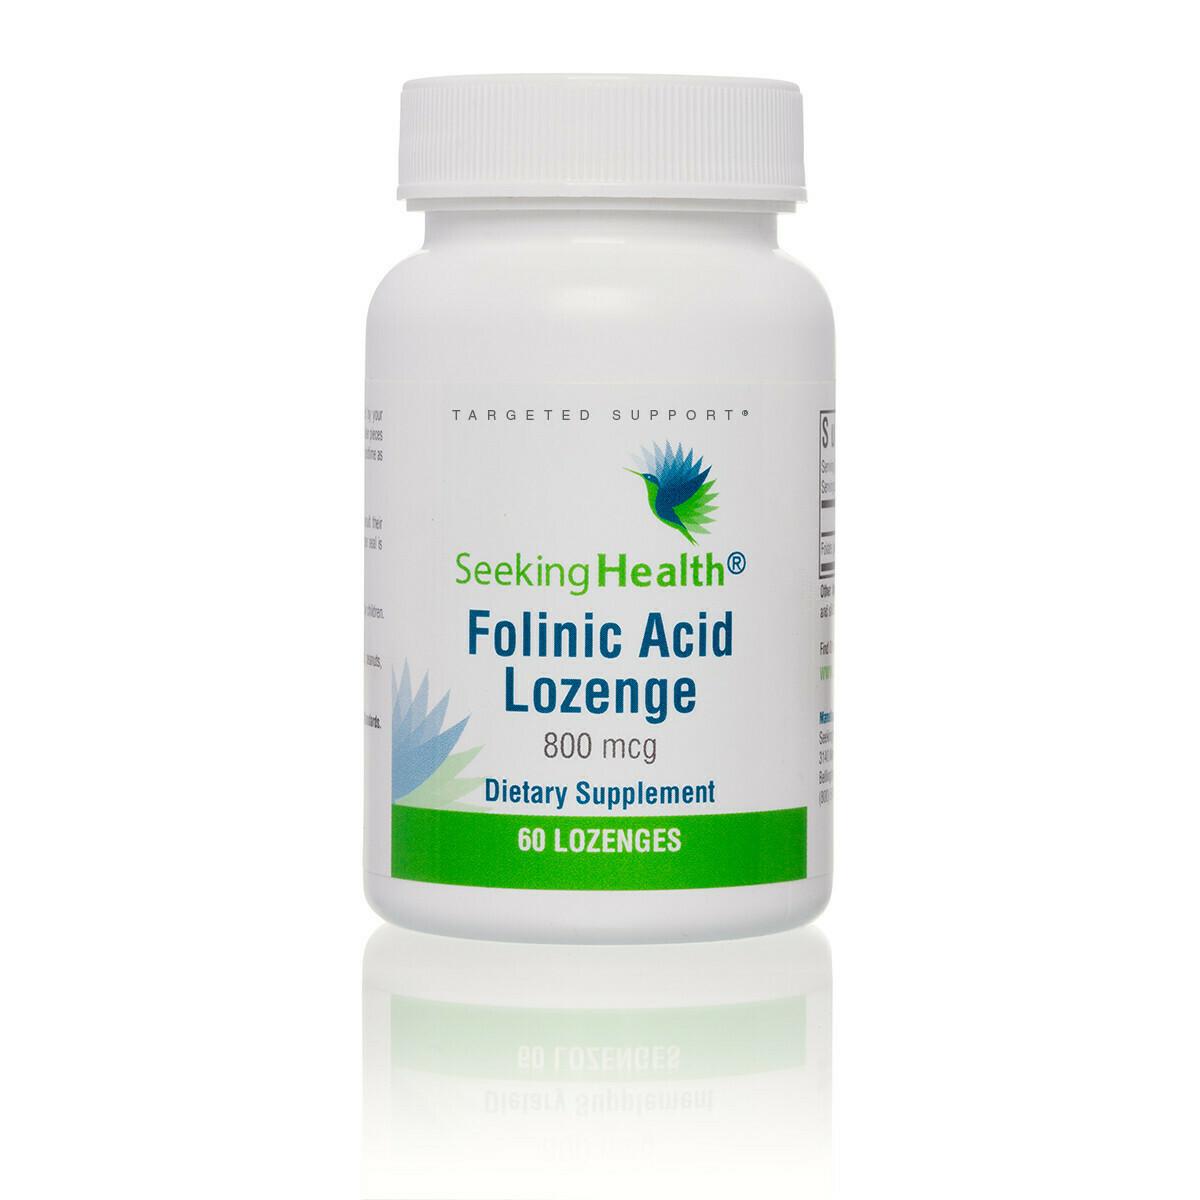 FOLINIC ACID LOZENGE - 60 LOZENGES Seeking Health